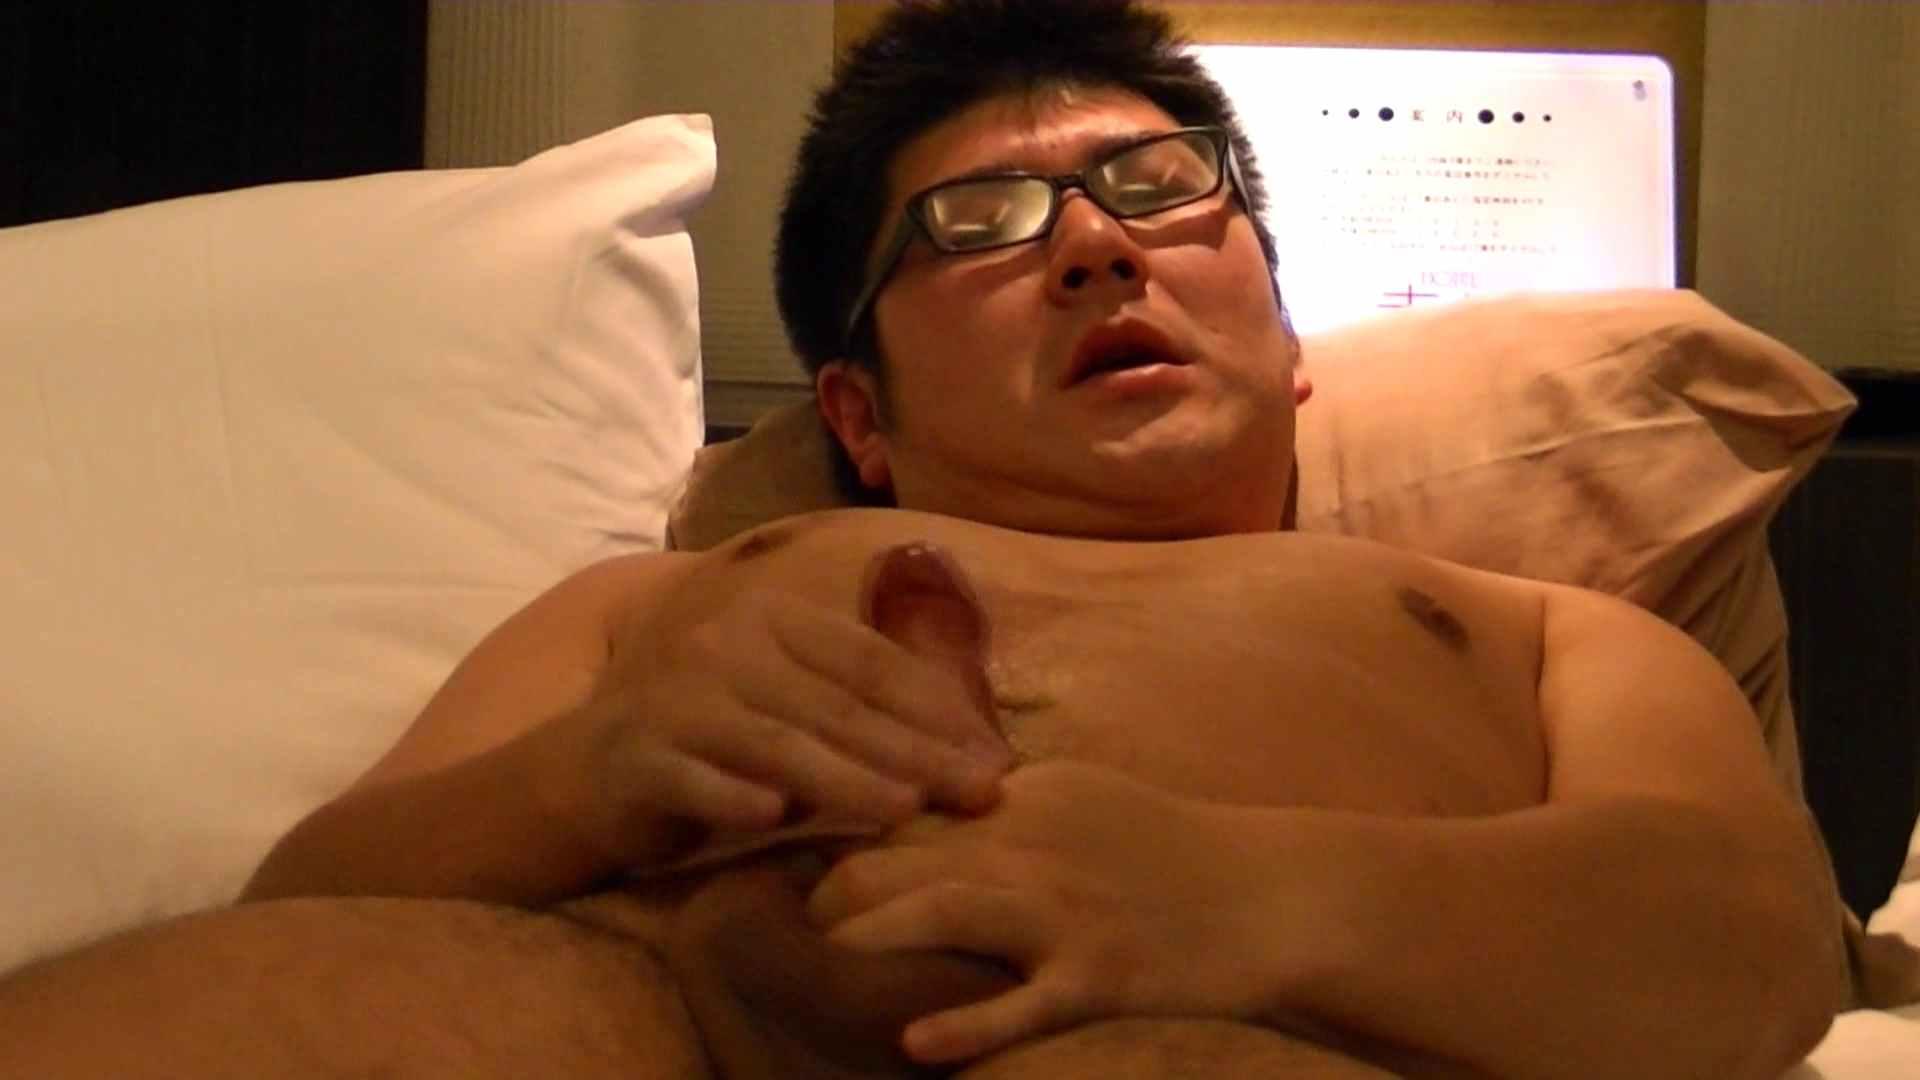 Mr.オナックスさん投稿!HD 貴方のオナニー三万円で撮影させてください。VOL.03 後編 オナニー編 ゲイAV画像 106枚 104